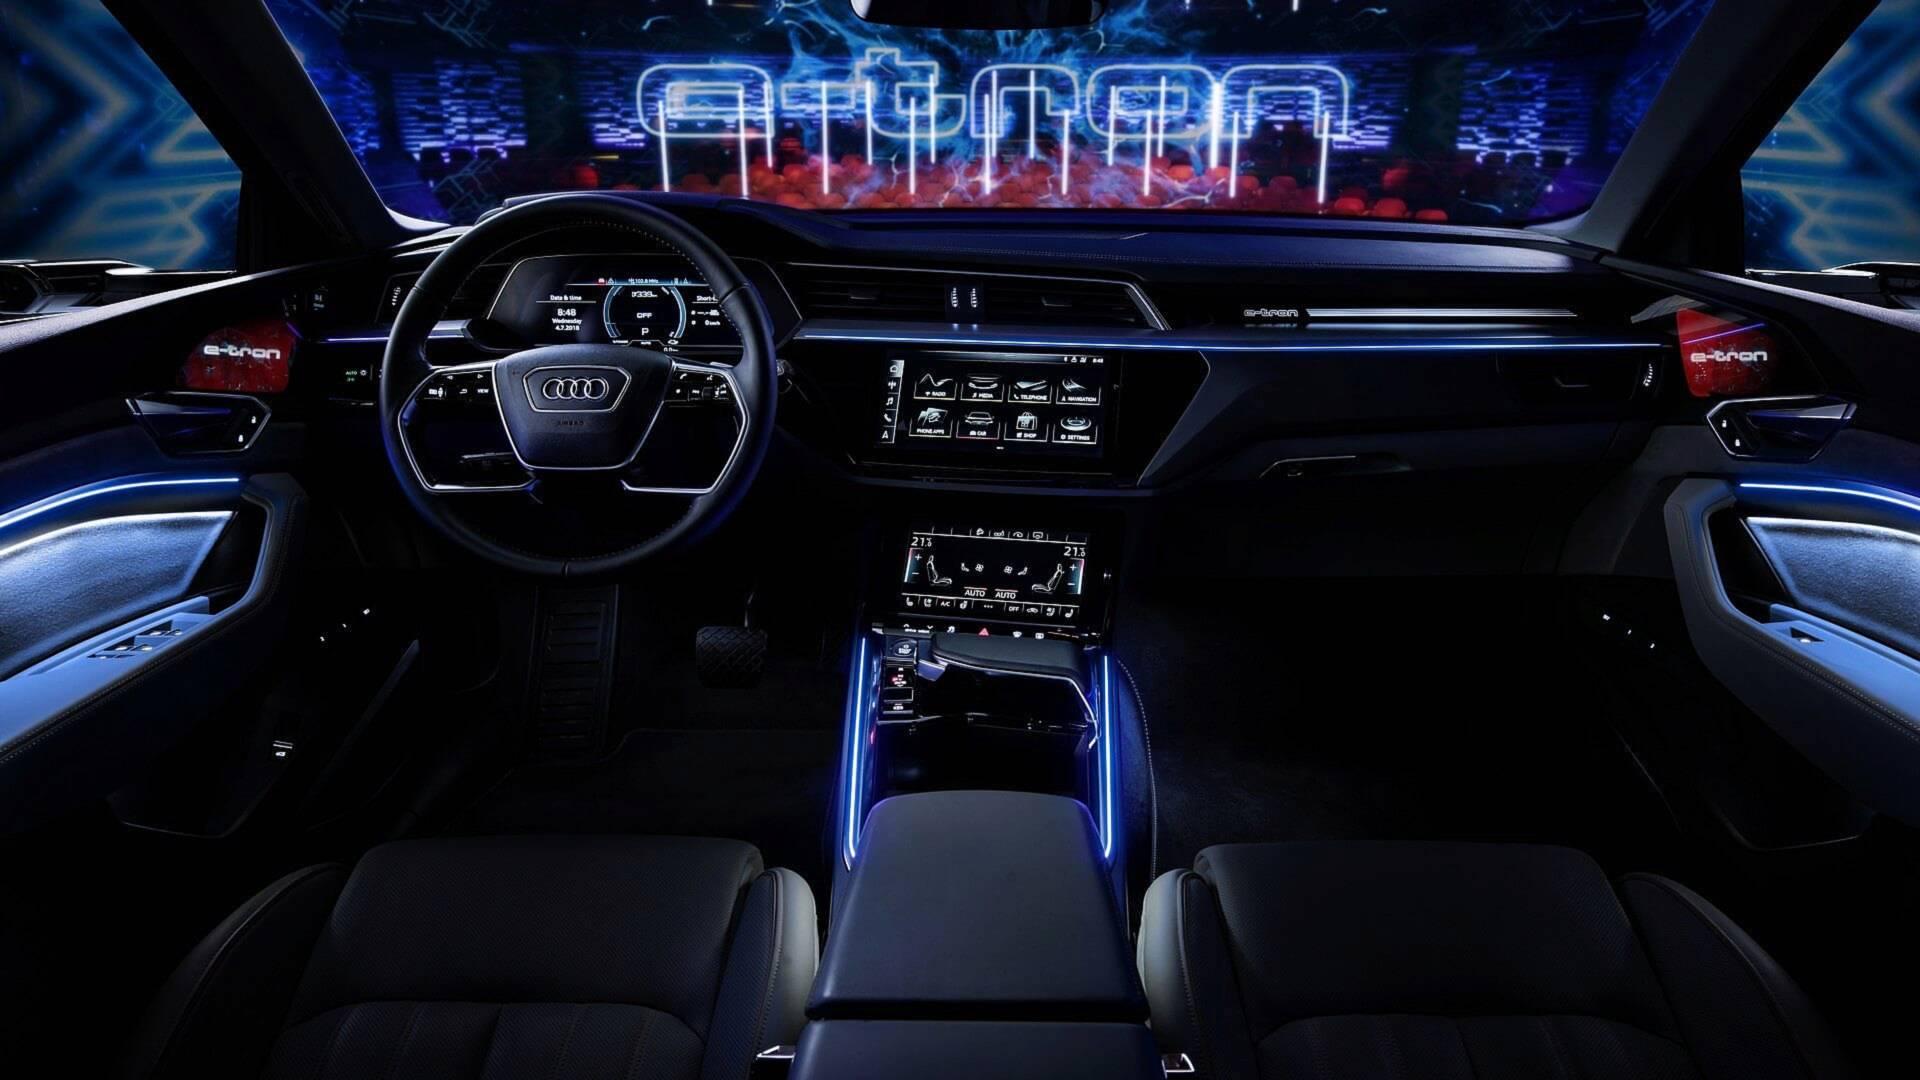 2019 Audi E Tron Interior Revealed Five Screens Rear